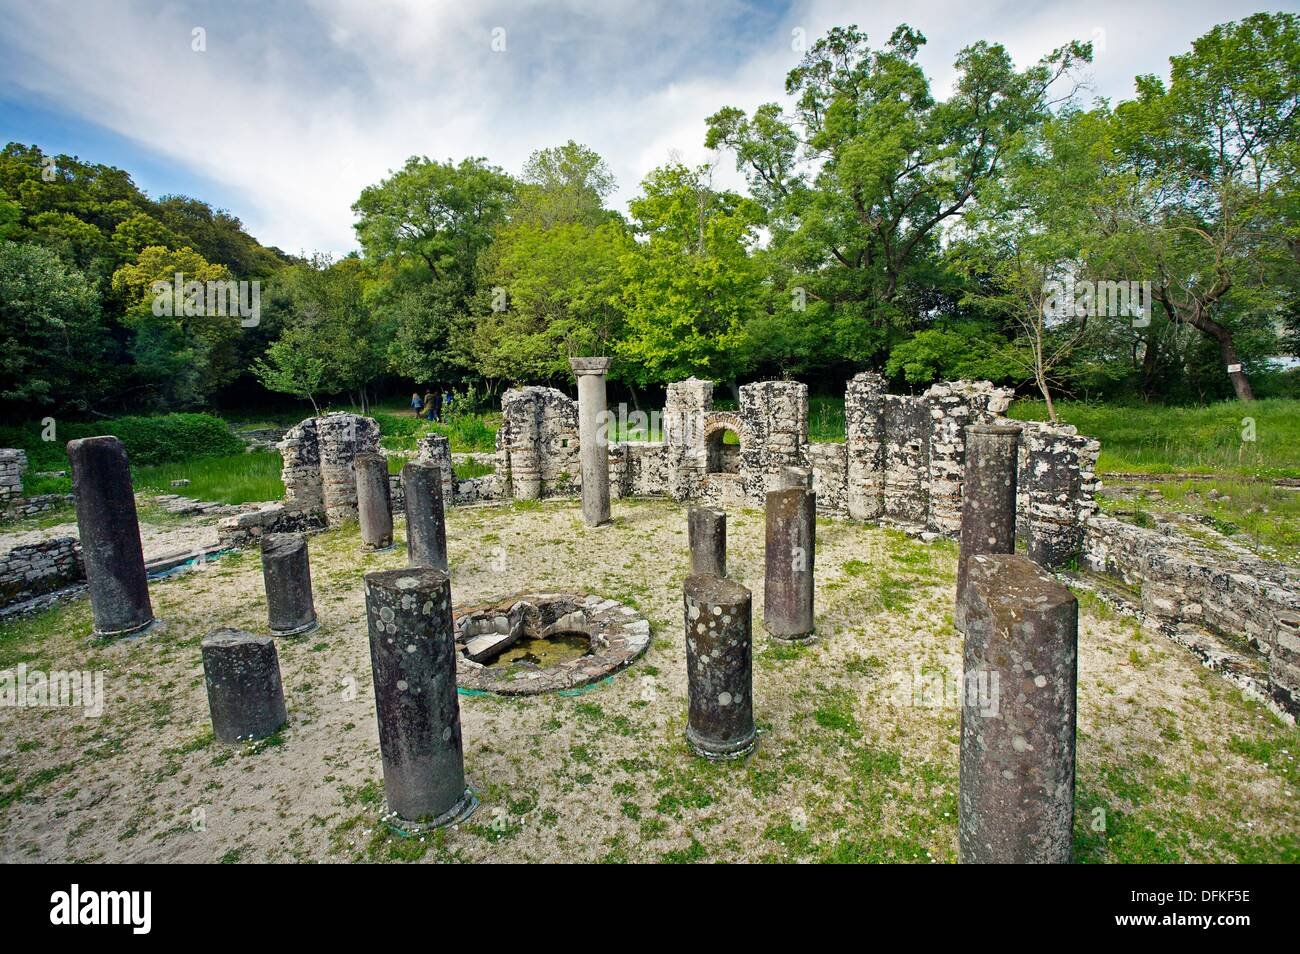 El Baptisterio. 6º siglo DC. La UNESCO. Patrimonio de la Humanidad. Butrint. Albania. Foto de stock